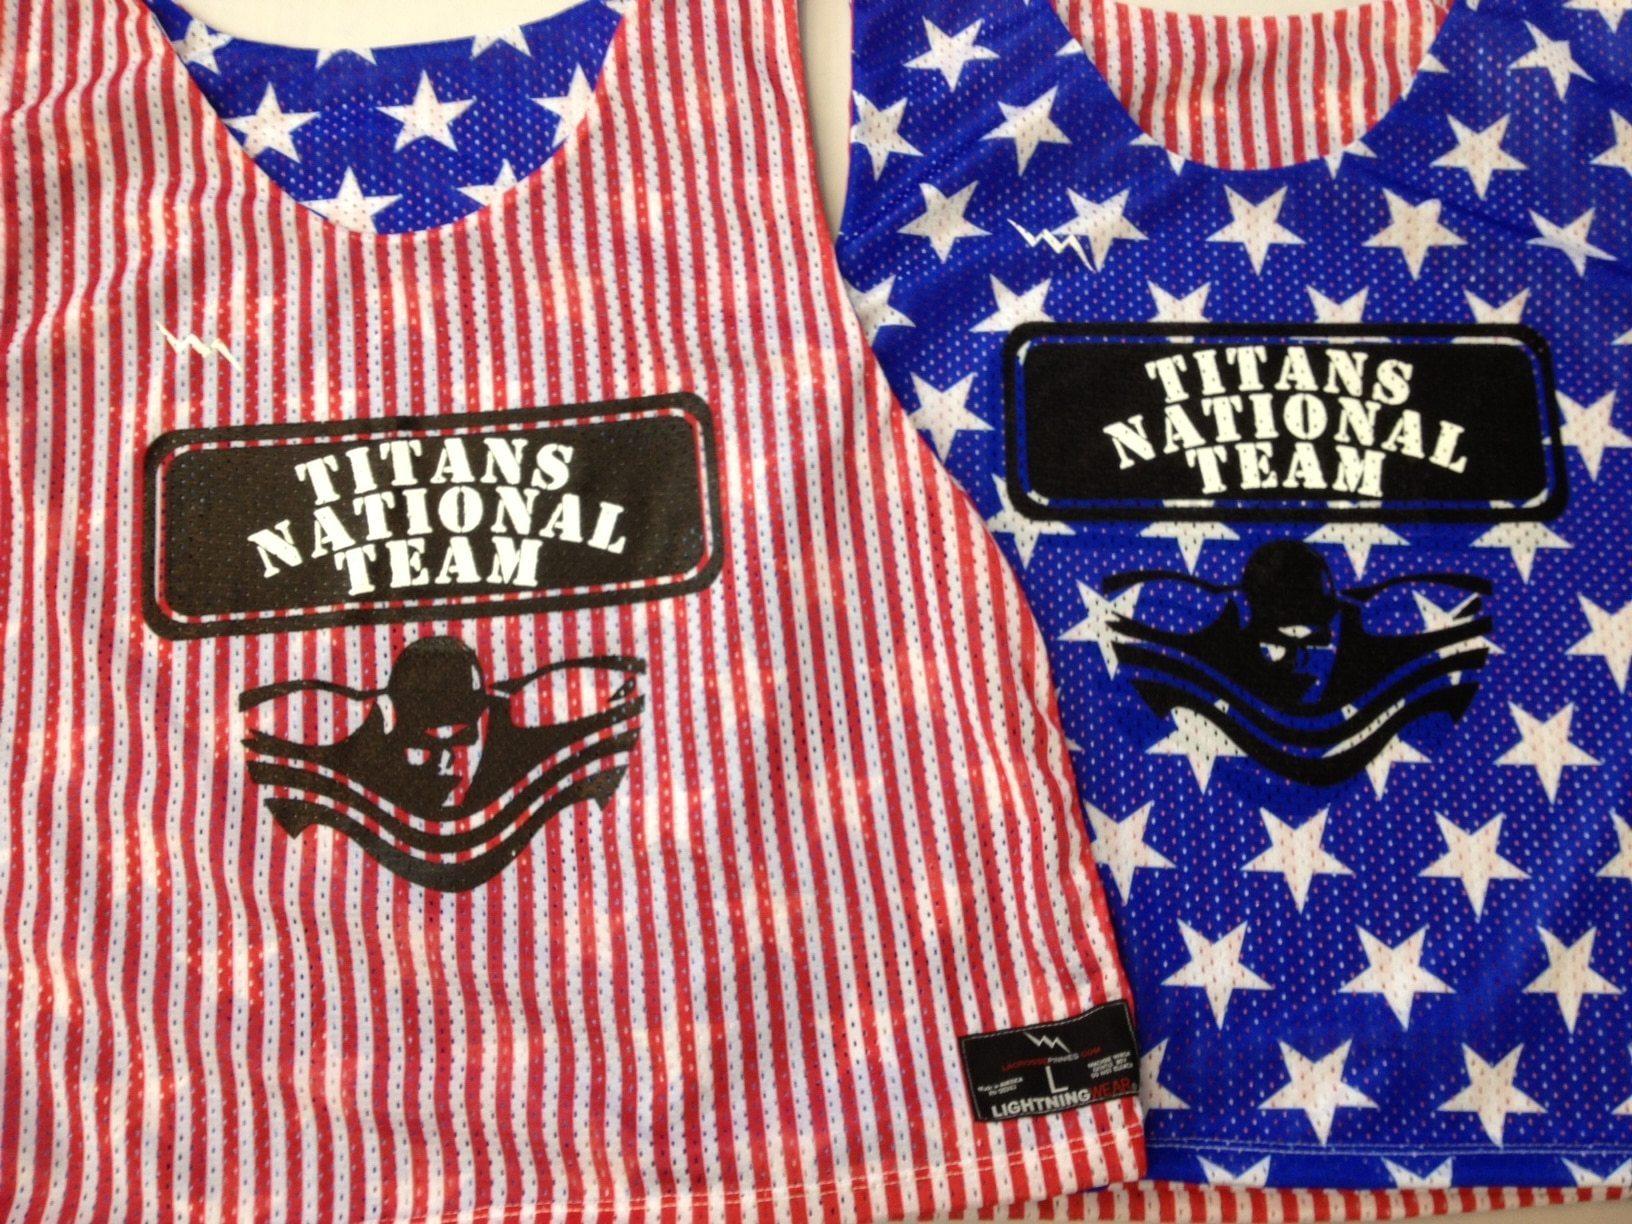 titans nation team pinnies - american flag pinnies